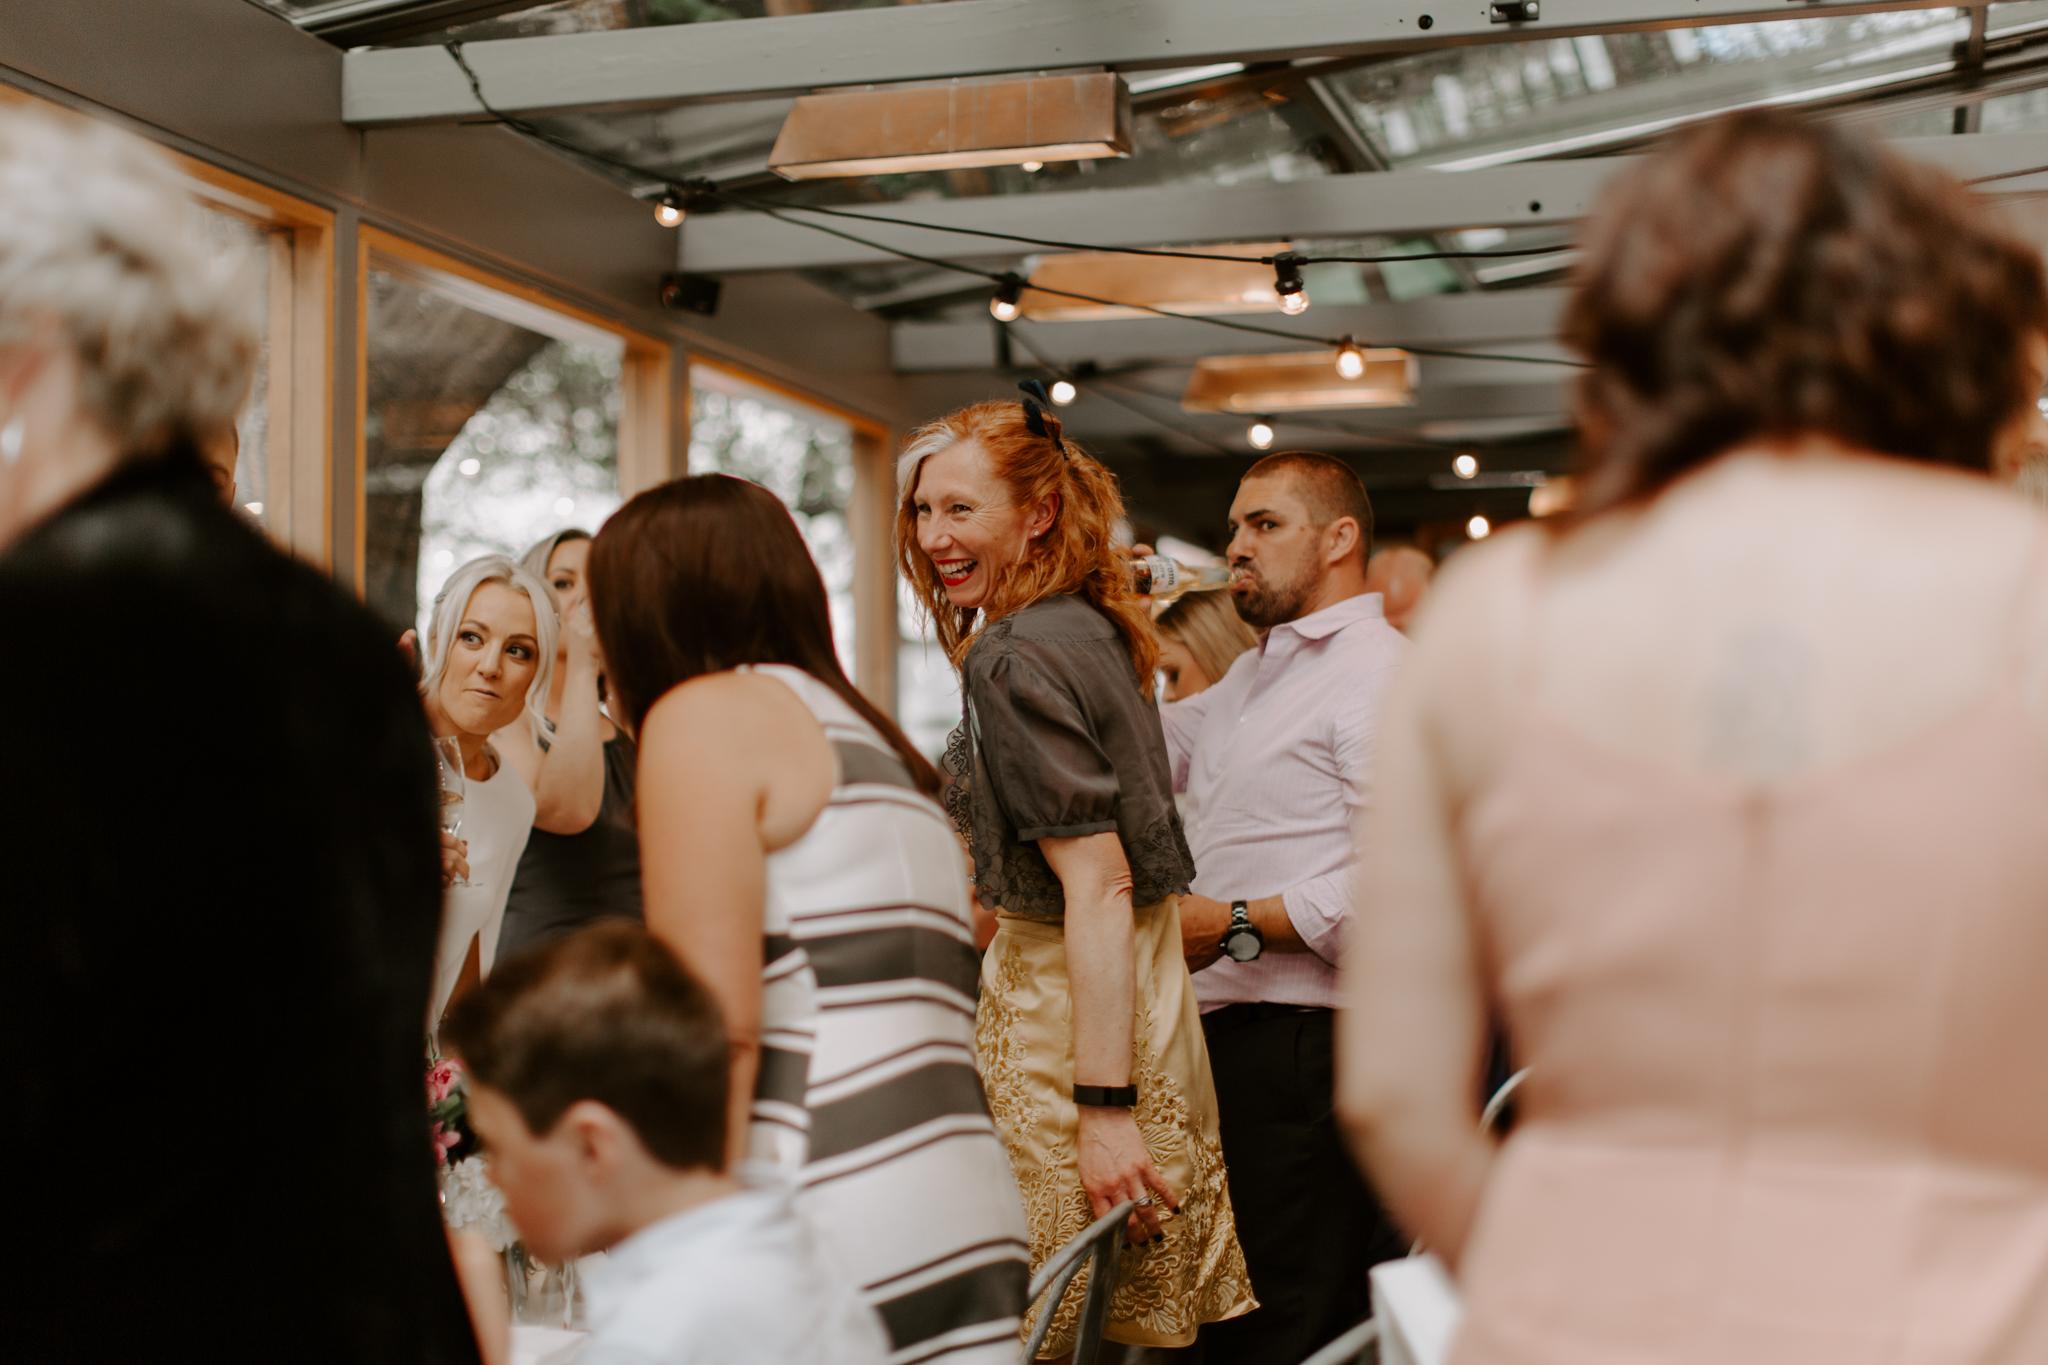 Trunk-restaurant-wedding-EmotionsandMath-077.jpg